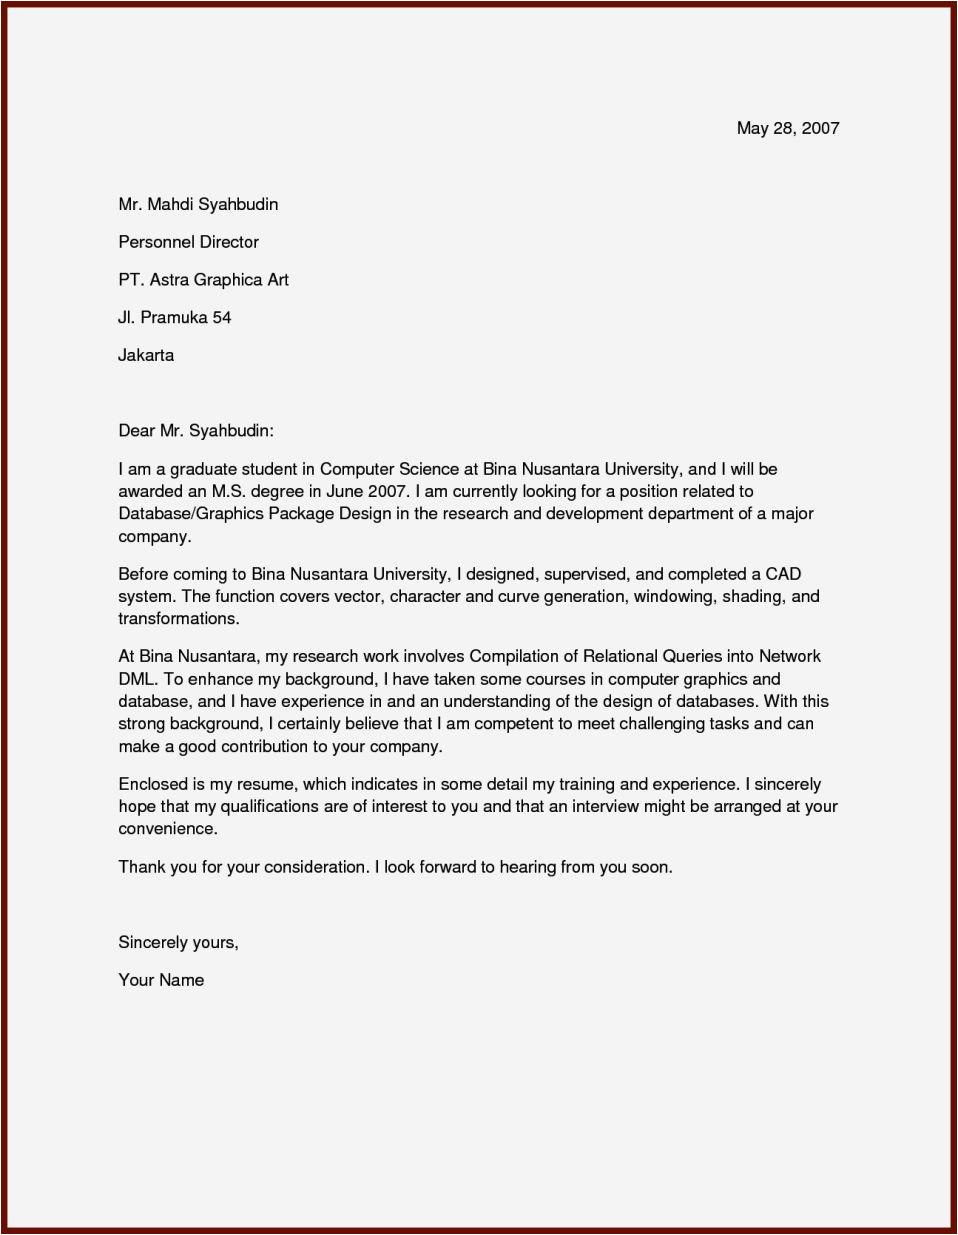 draft application letter for a job